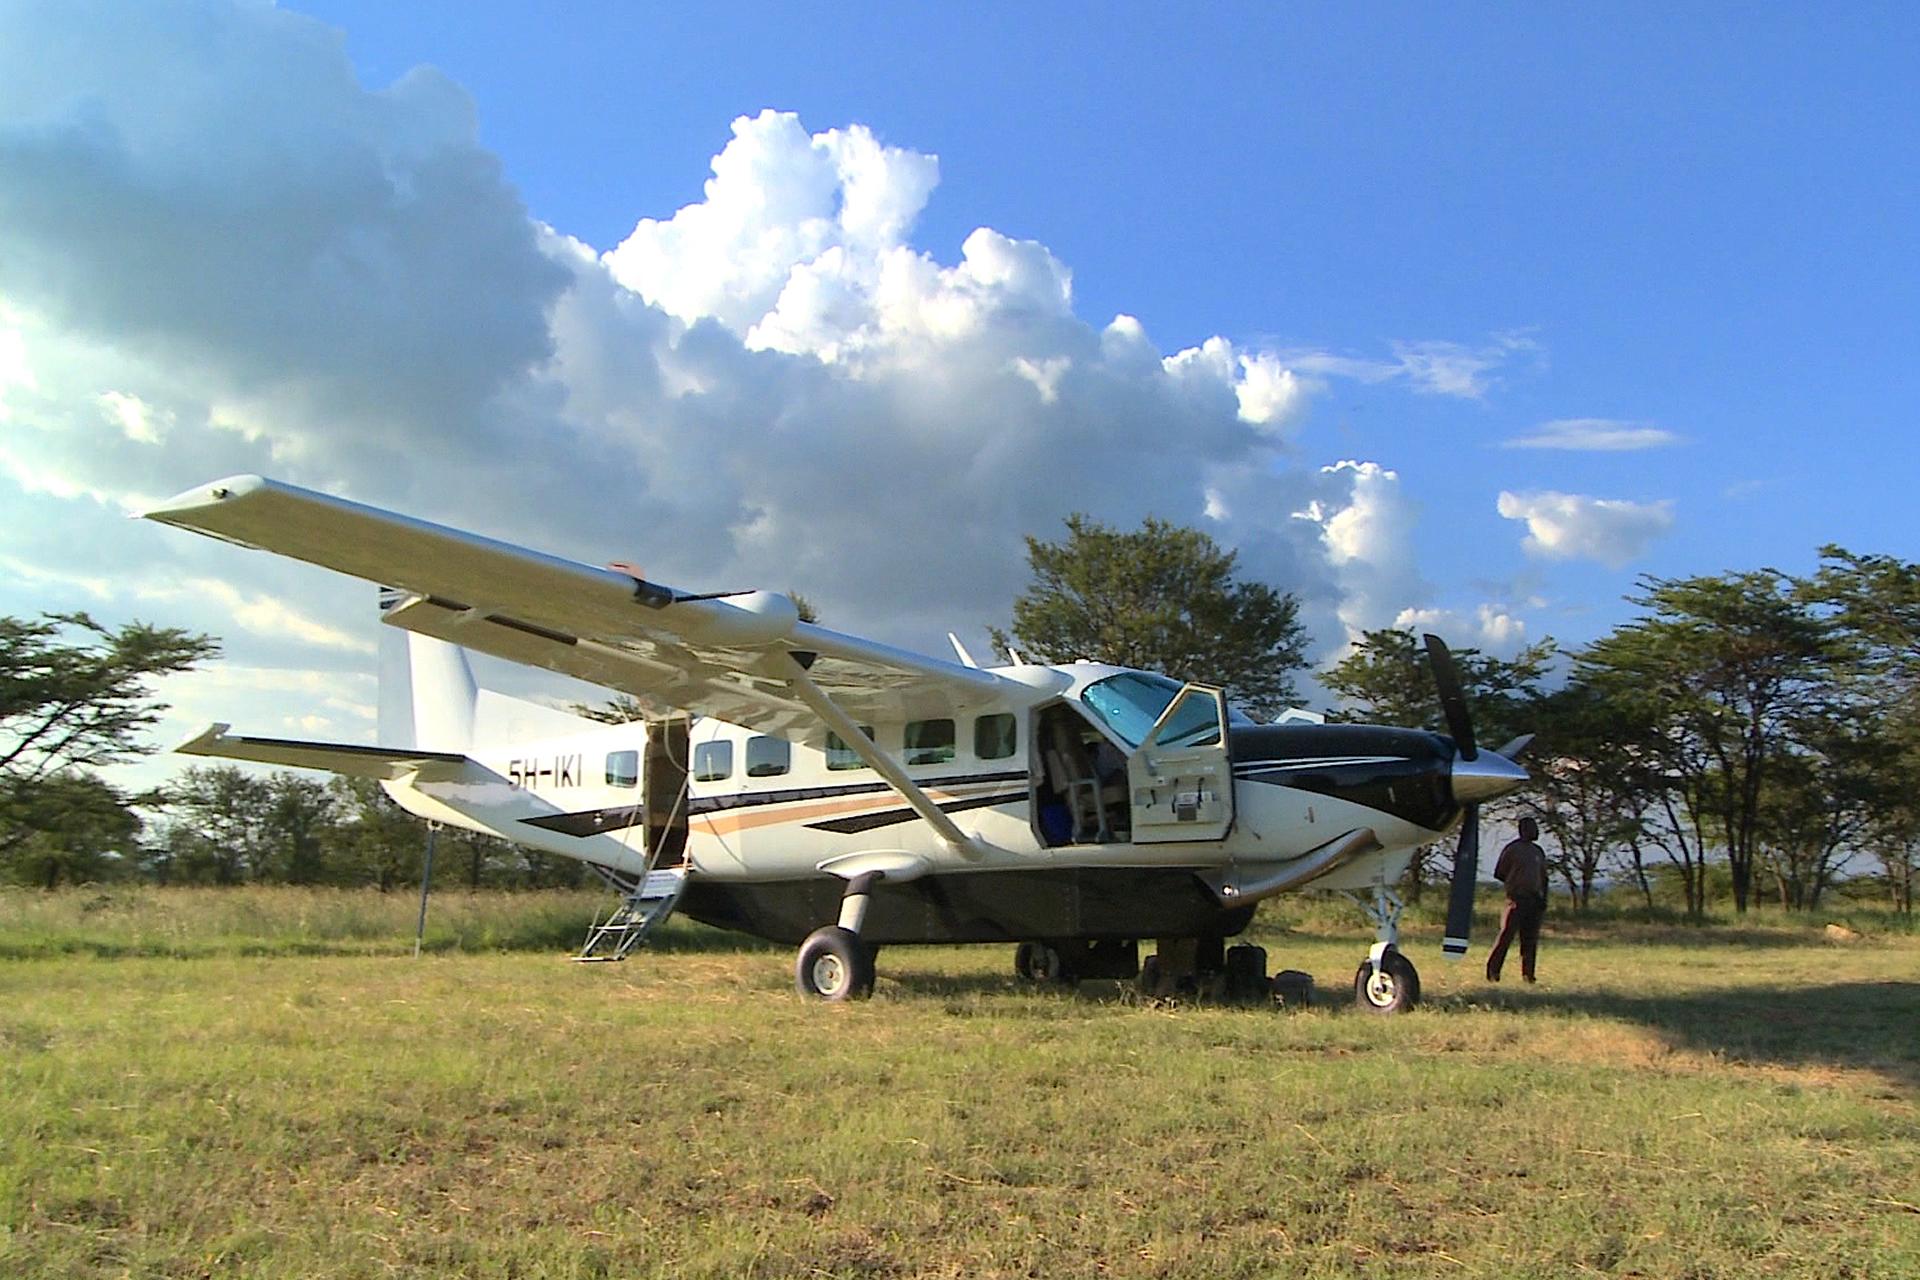 LUXURY FLY - IN SAFARI